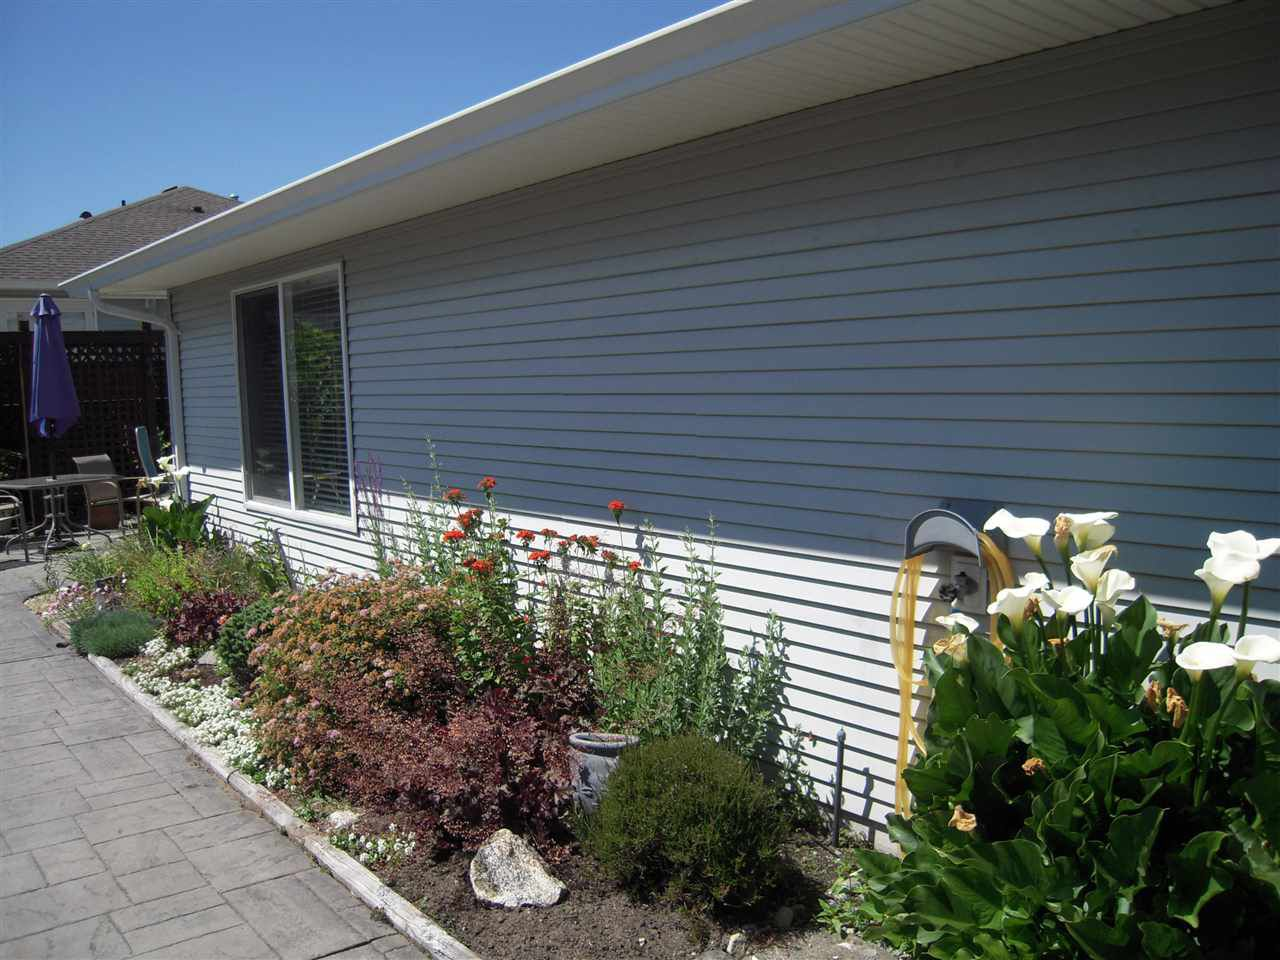 Photo 3: Photos: 5735 EMILY Way in Sechelt: Sechelt District House for sale (Sunshine Coast)  : MLS®# R2179124